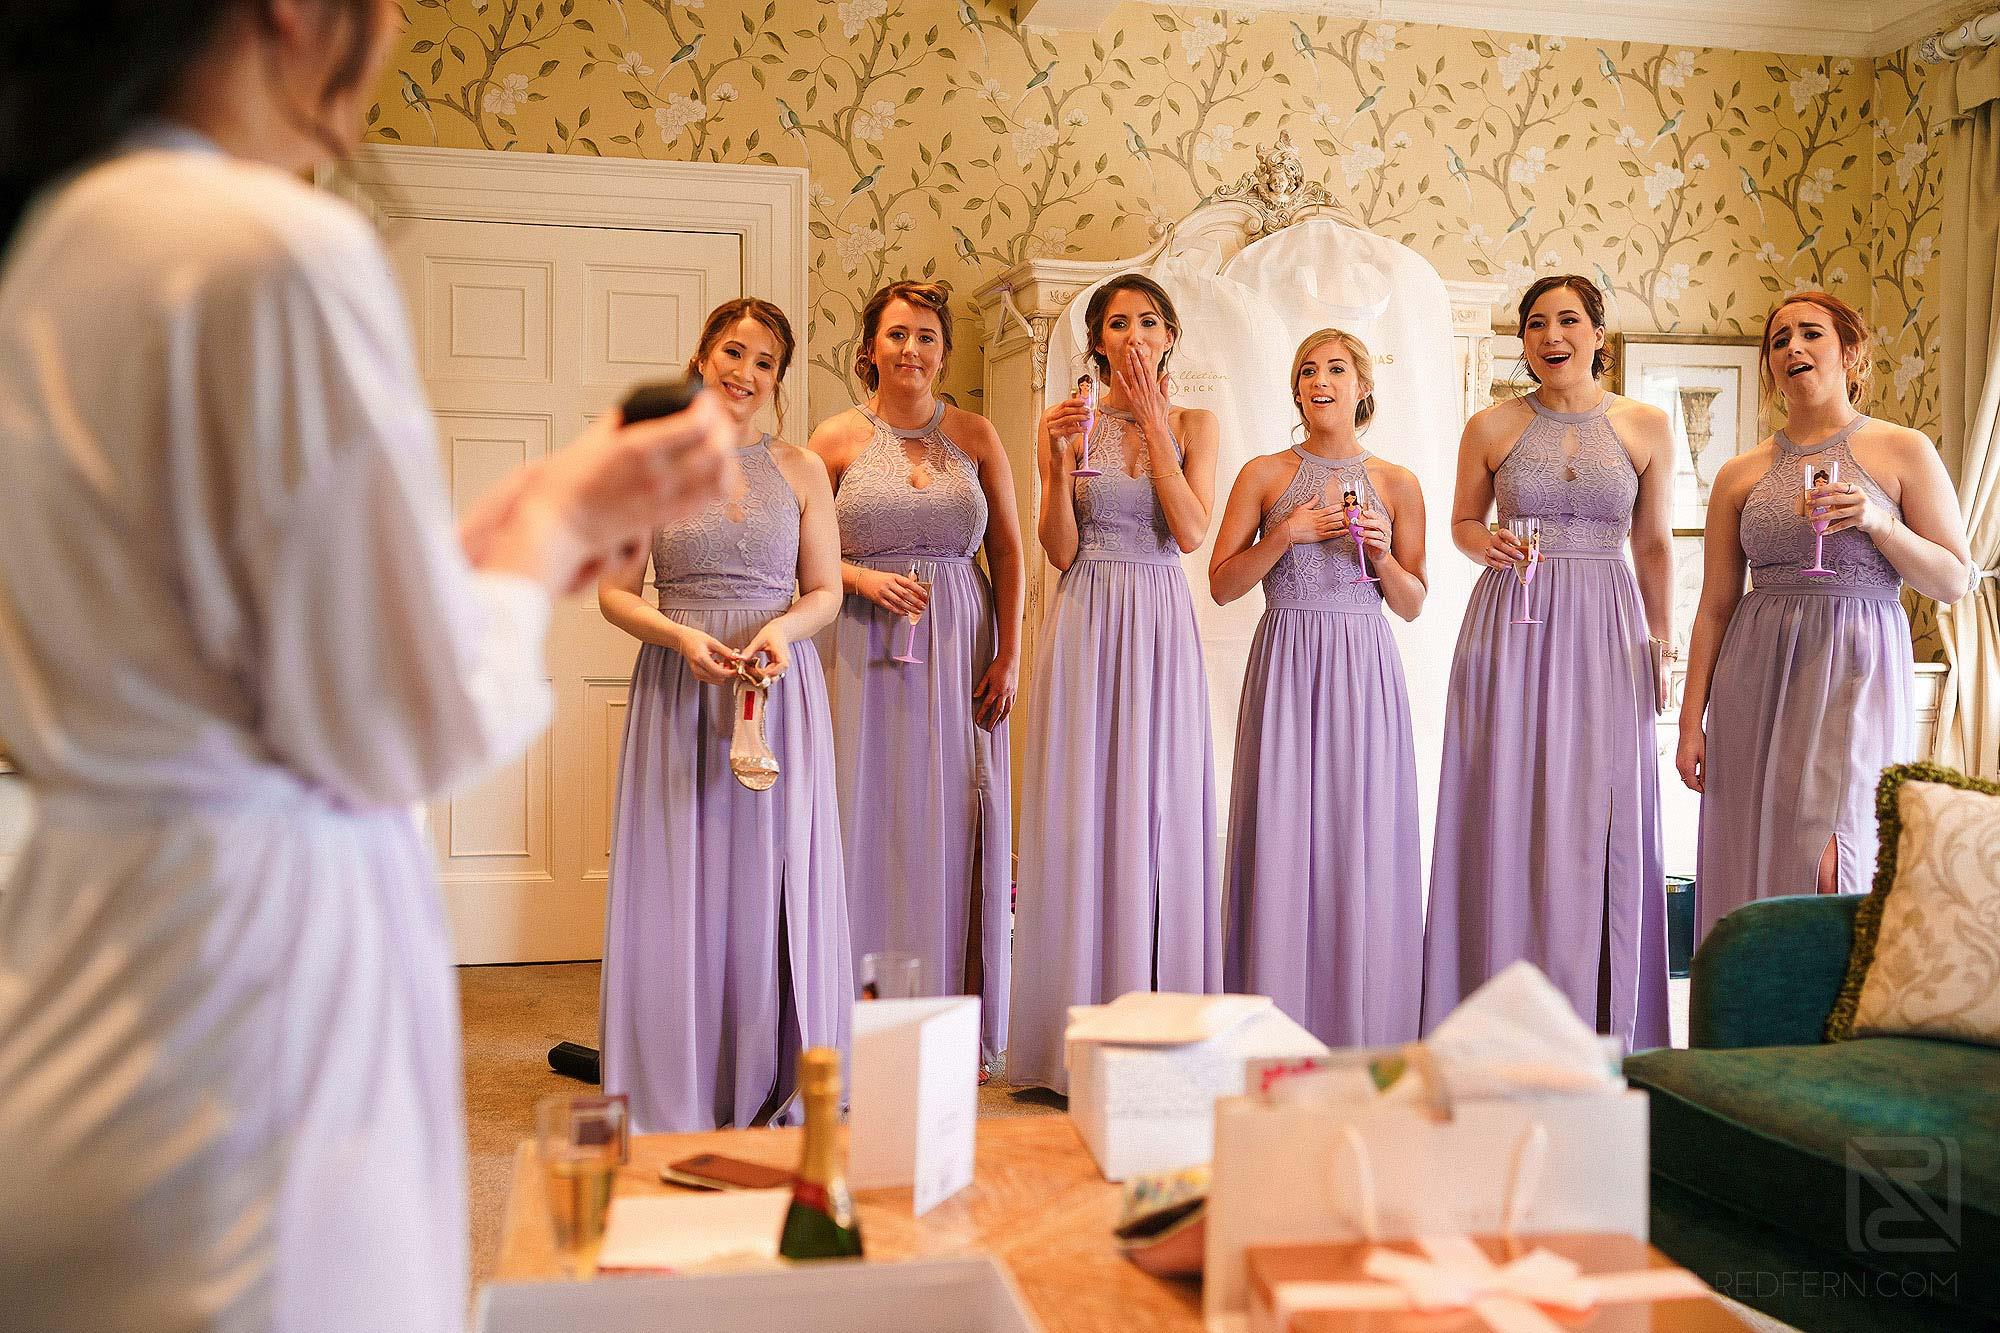 bridesmaids looking at Bride on wedding morning